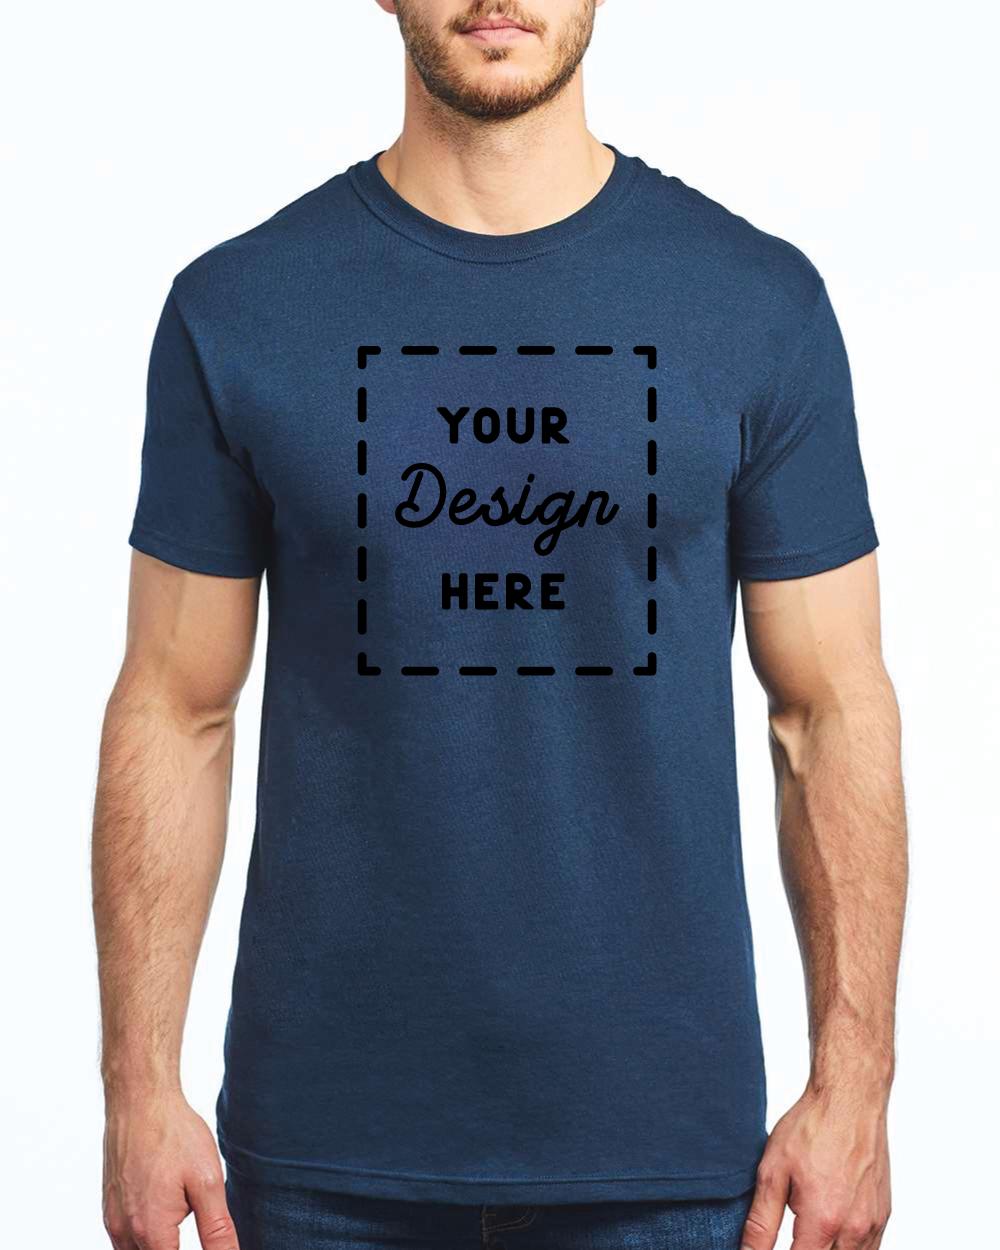 Customizable T-Shirt